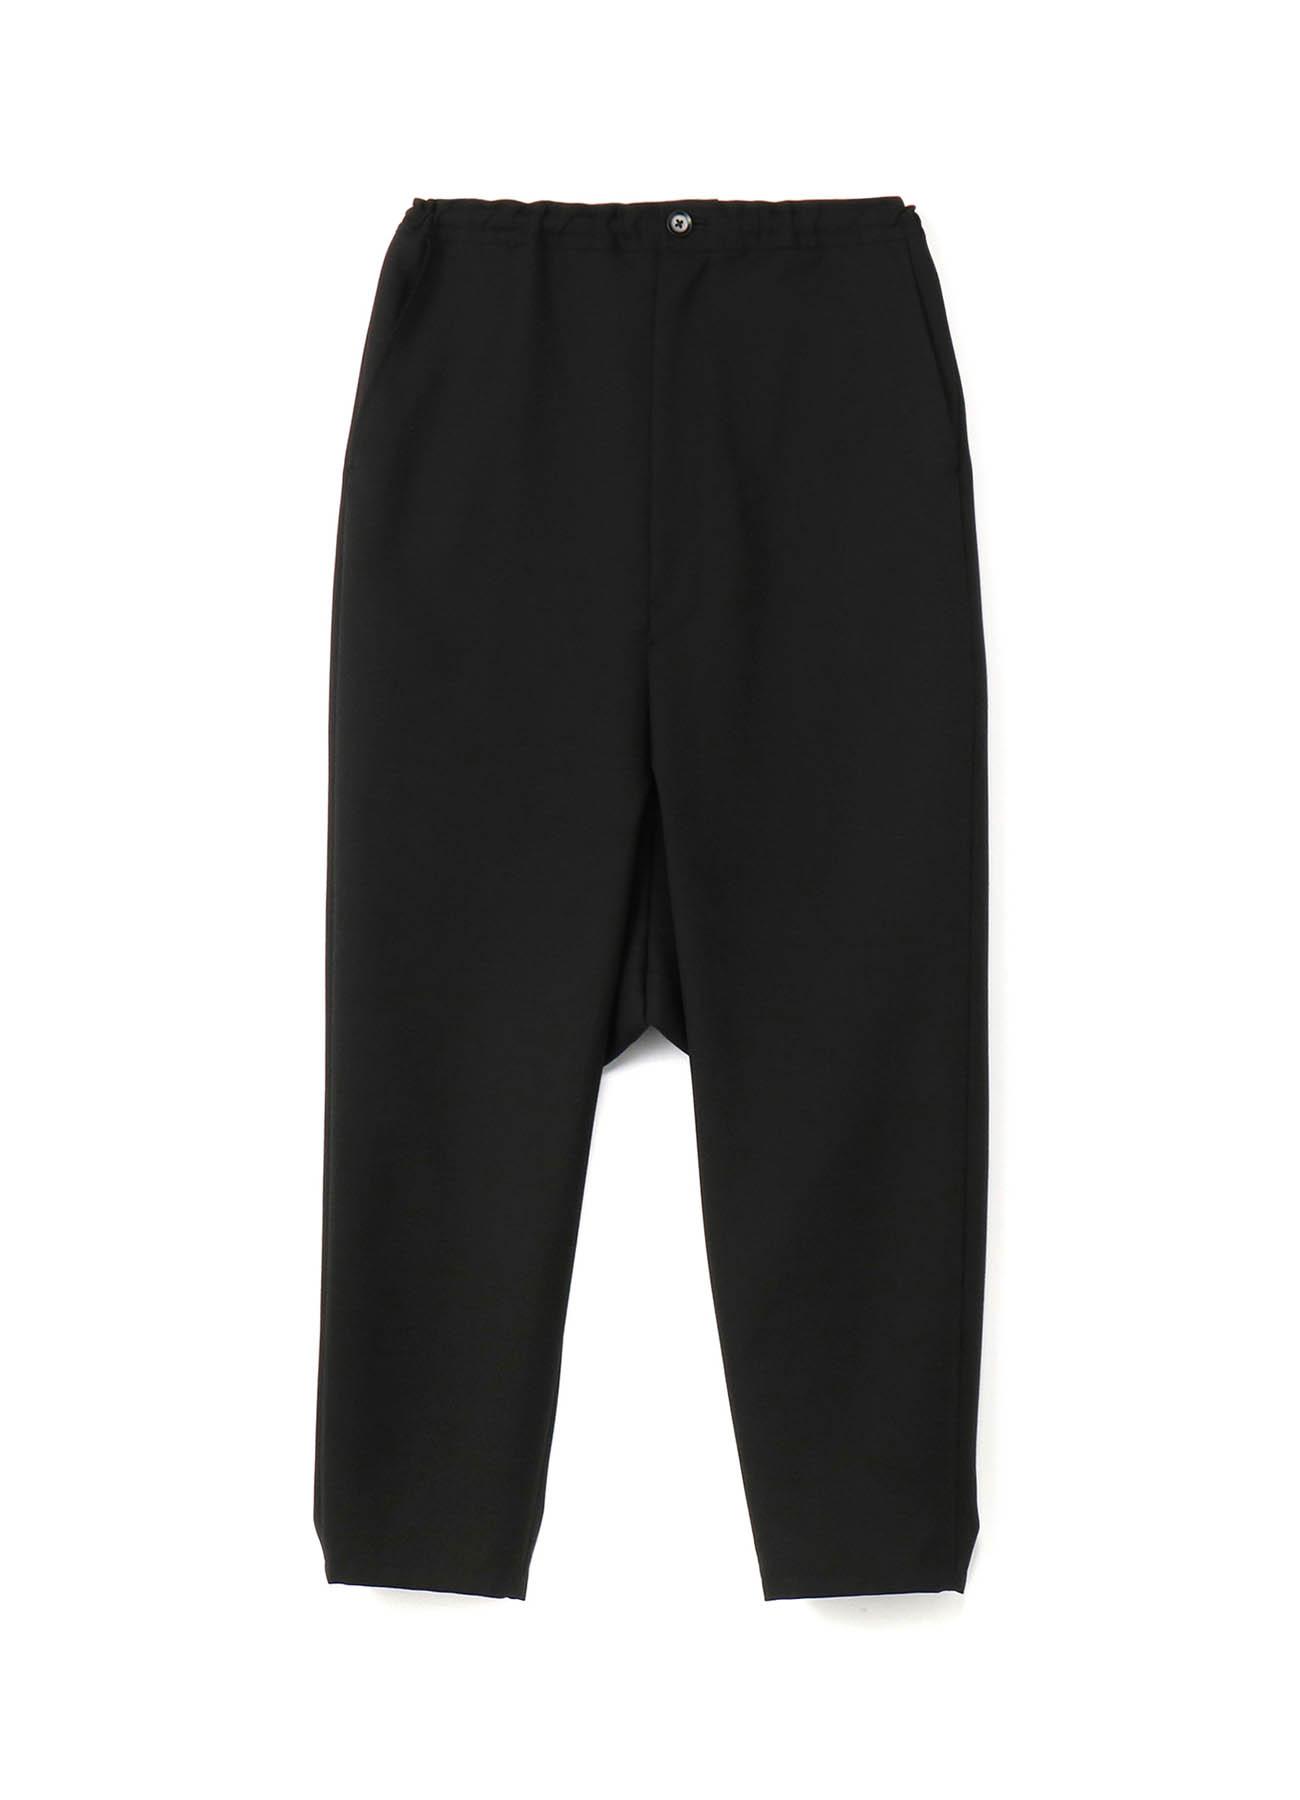 T/W gaberdine Sarouel Straight Pants